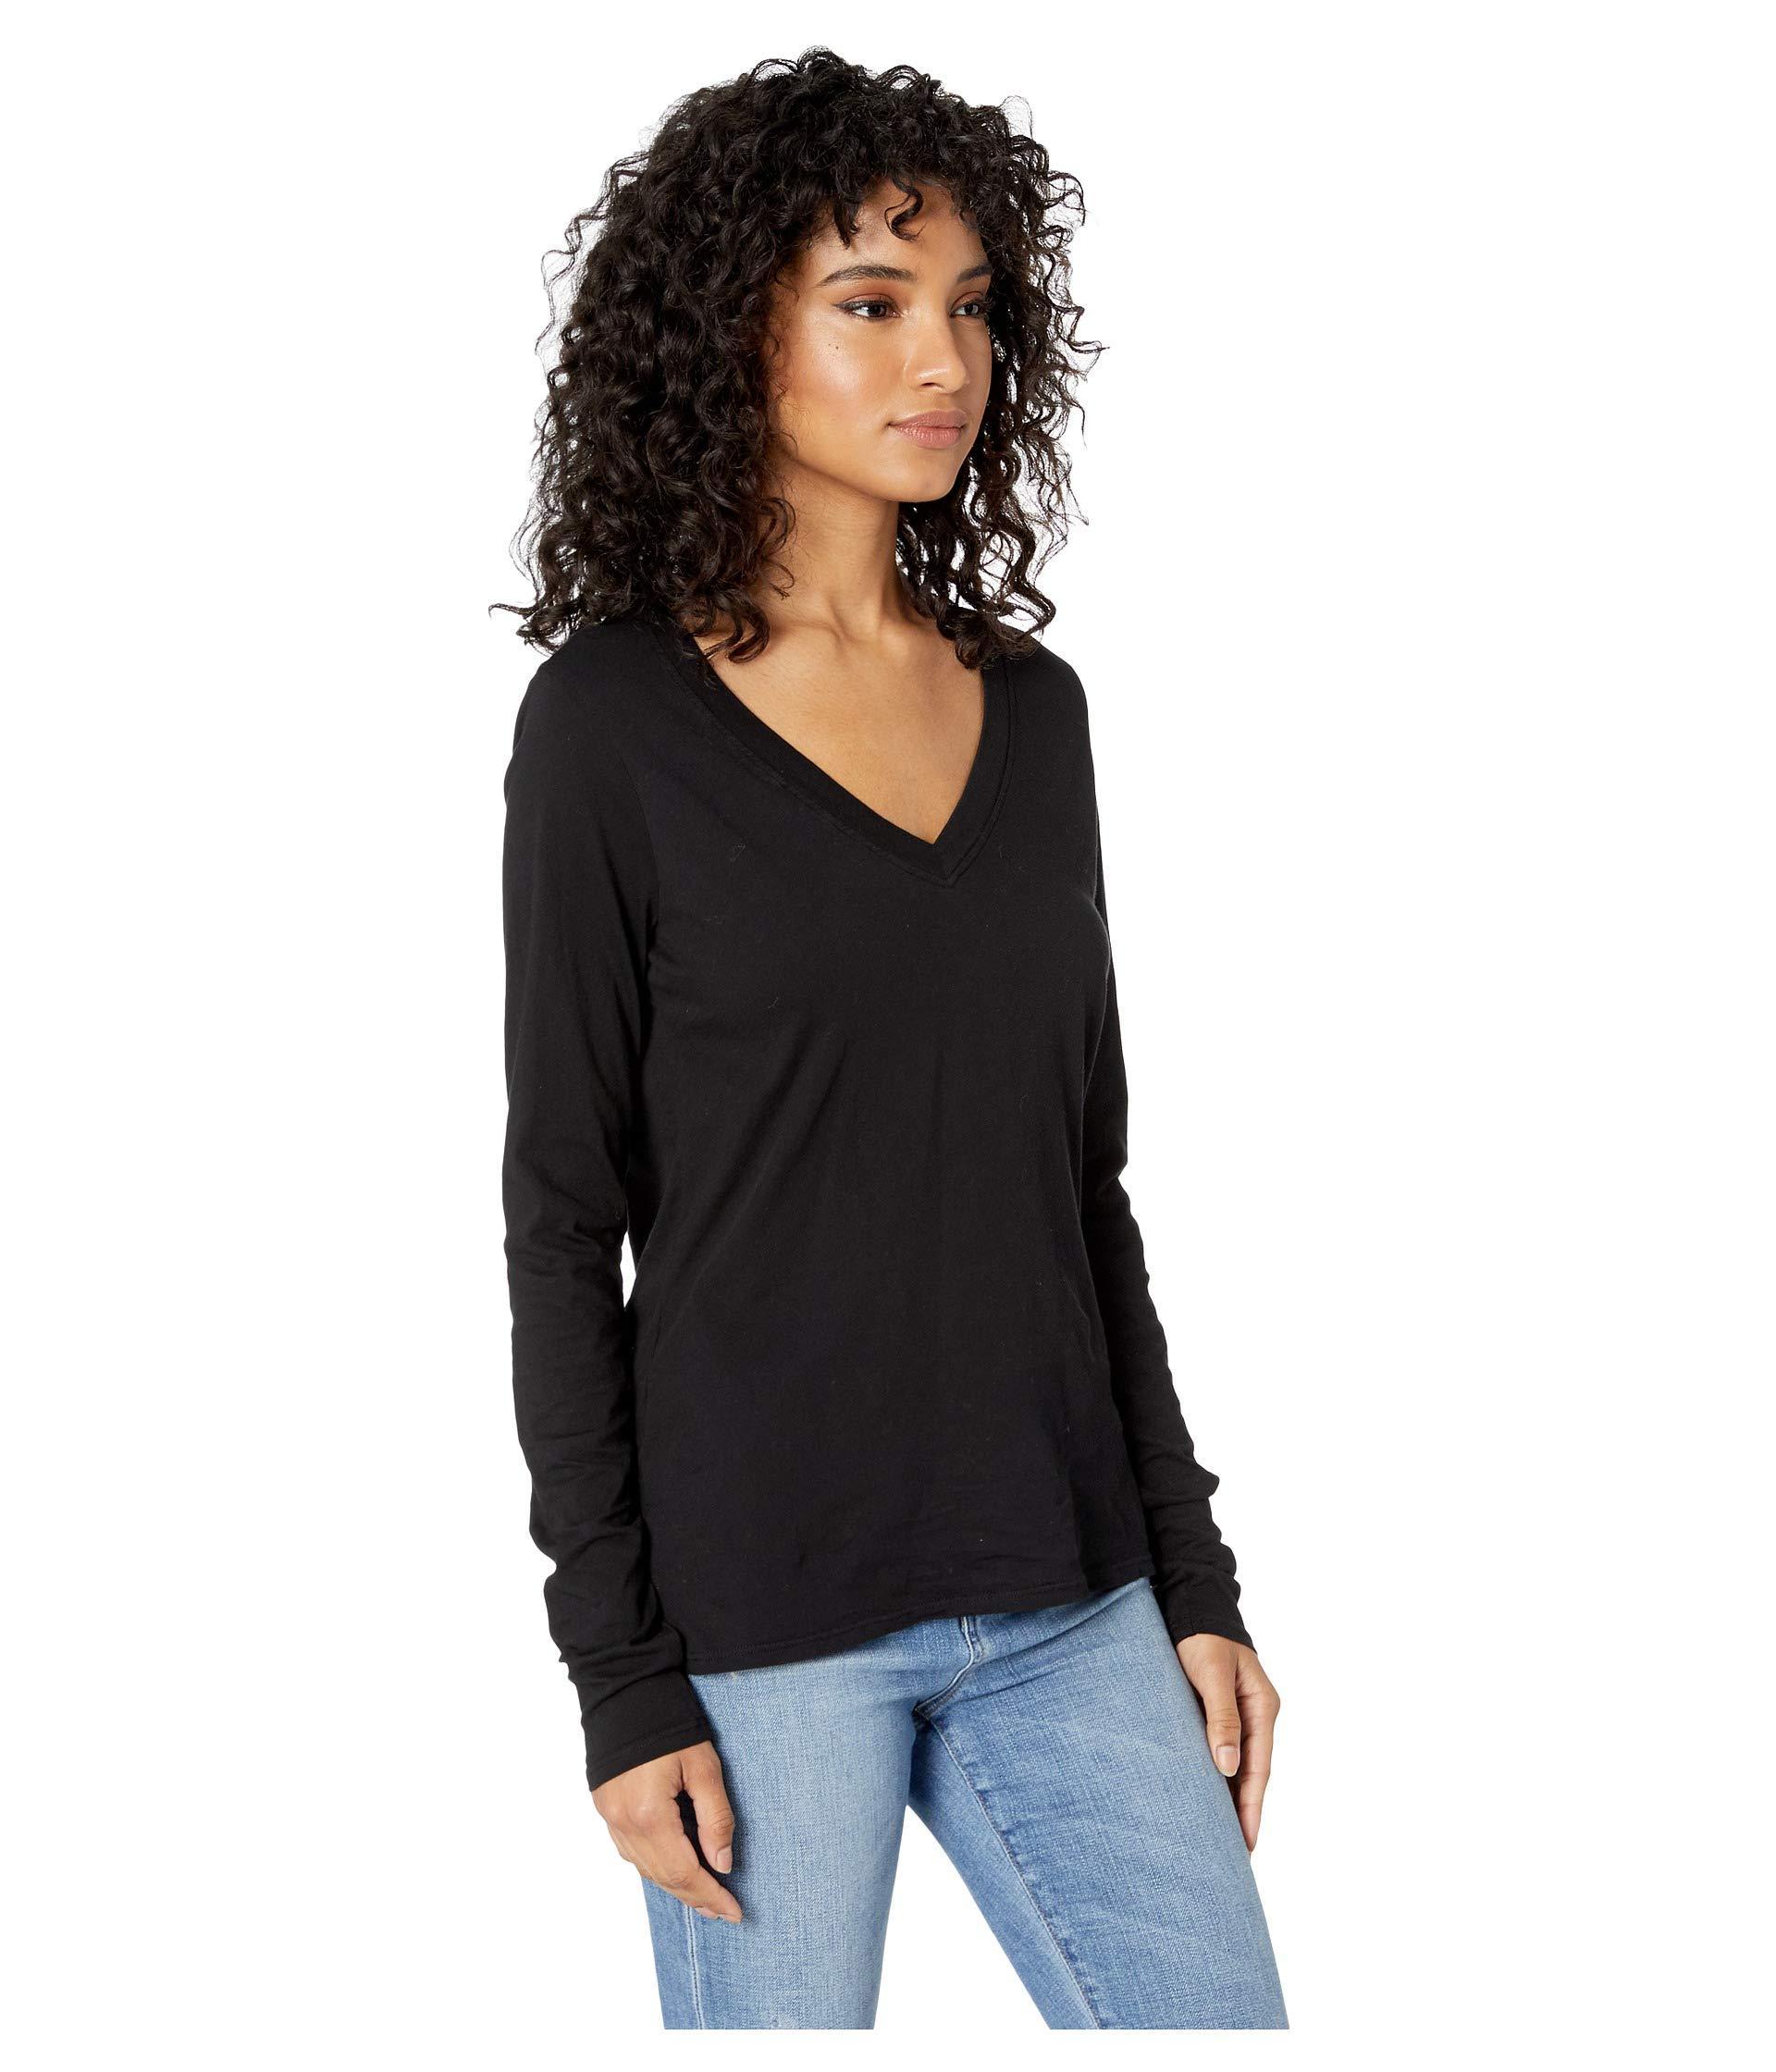 fd6b3a9f Lamade - Black Long Sleeve V-neck In Tissue Jersey - Lyst. View fullscreen